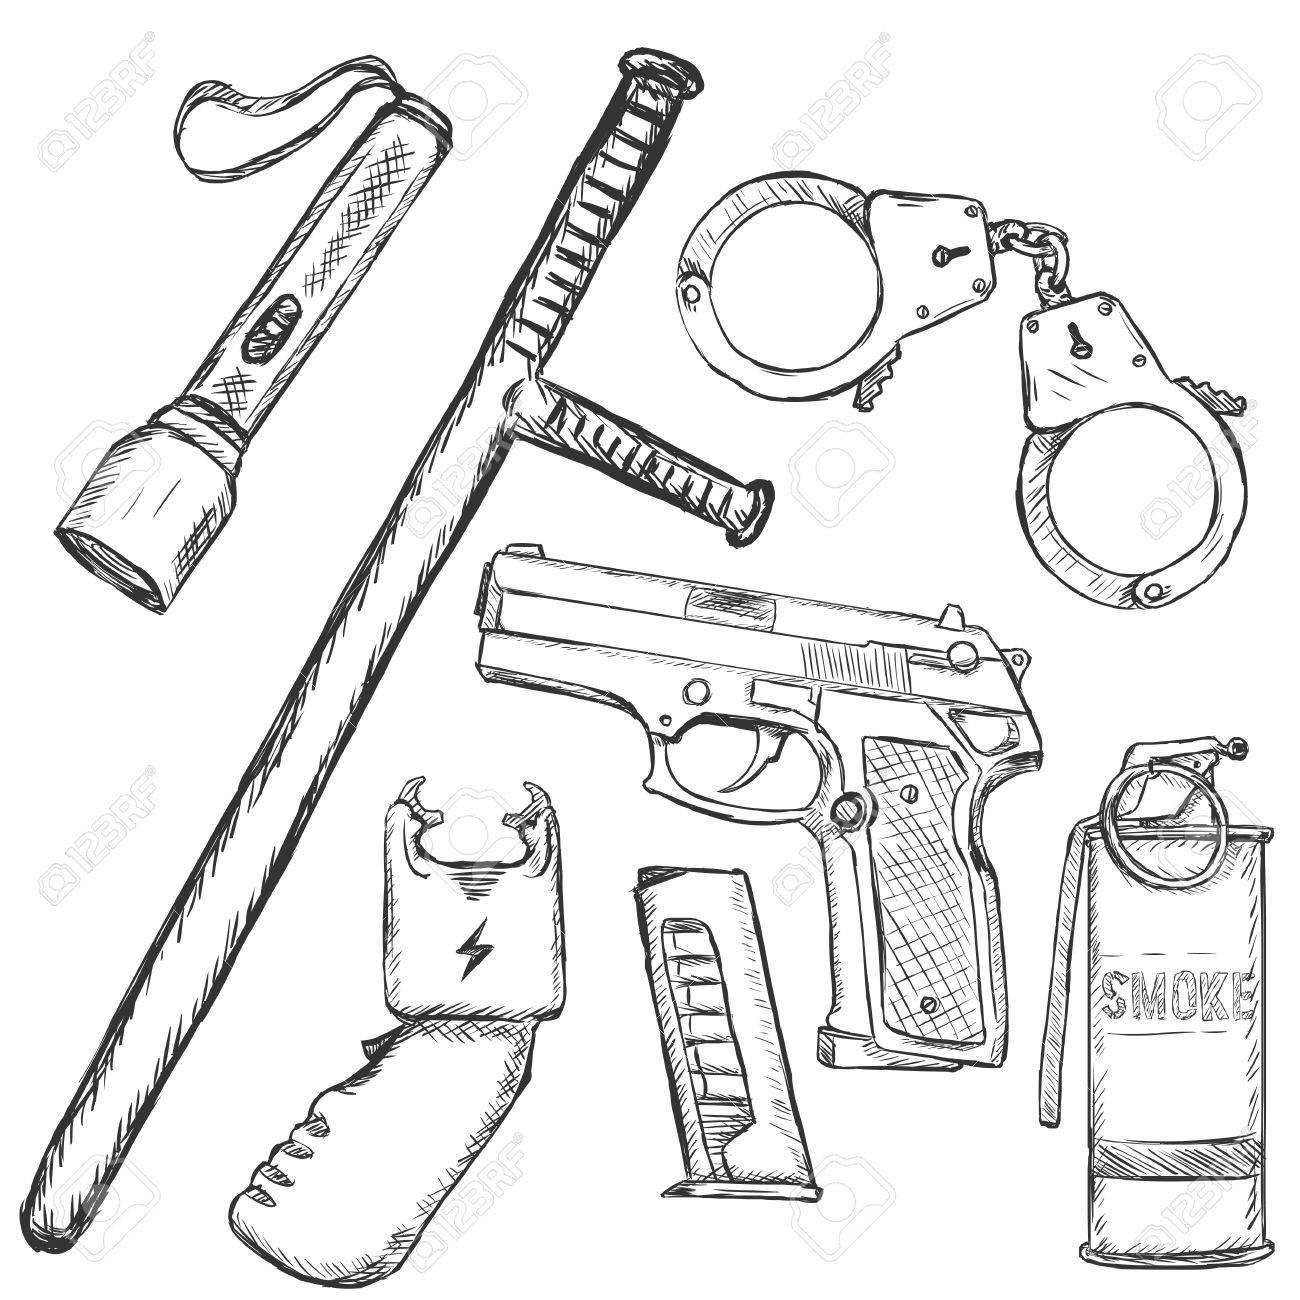 Police Drawing At Getdrawings